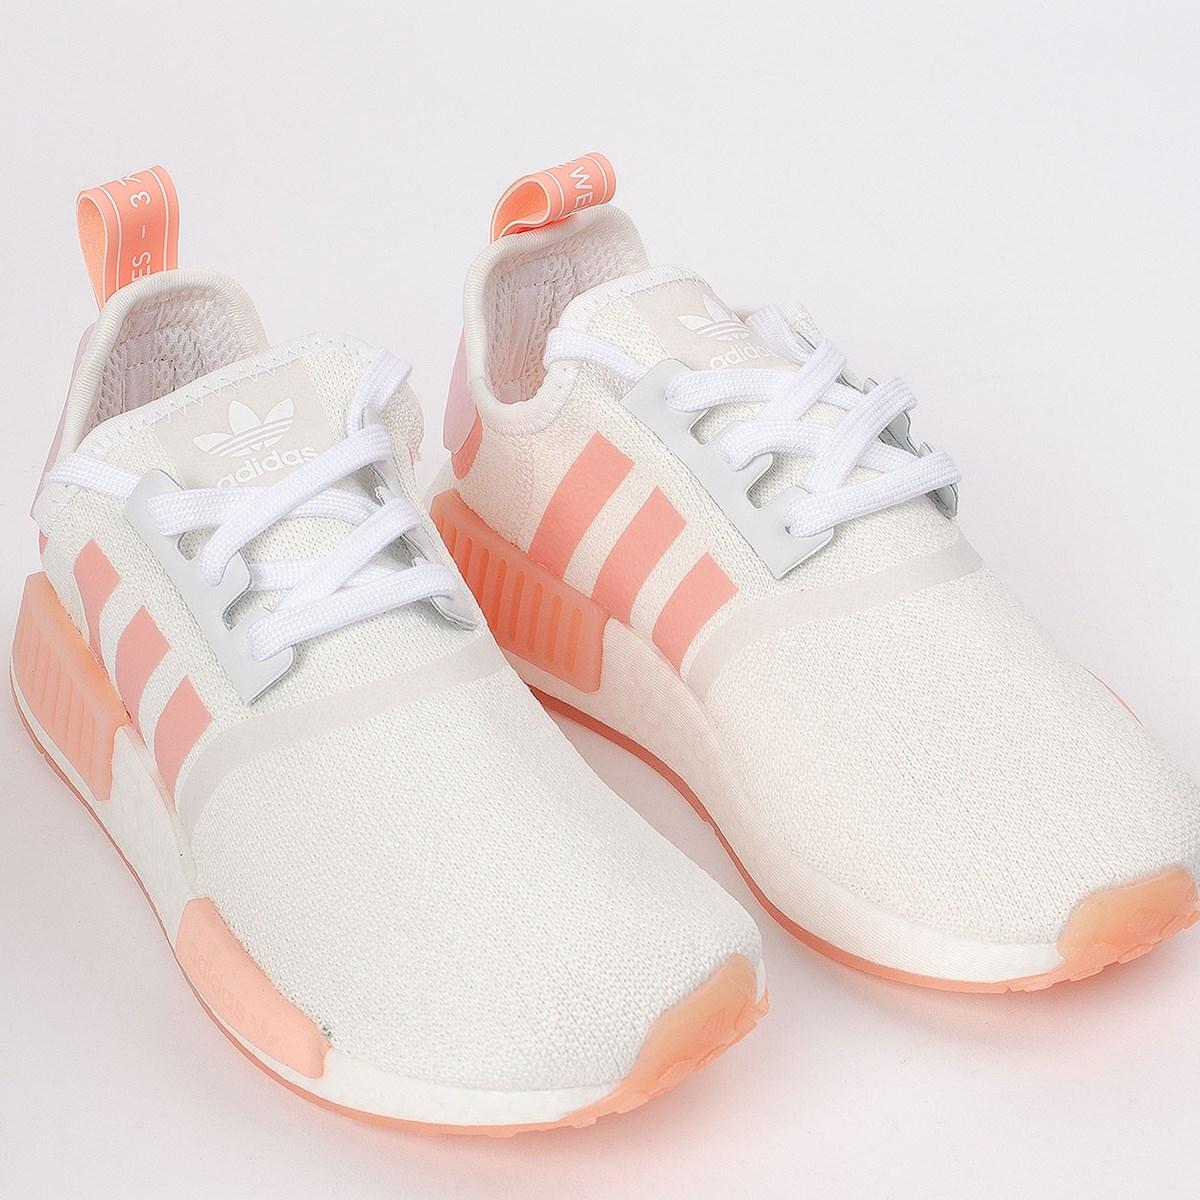 Tênis adidas NMD_R1 Ftwr White Haze Coral FV8730